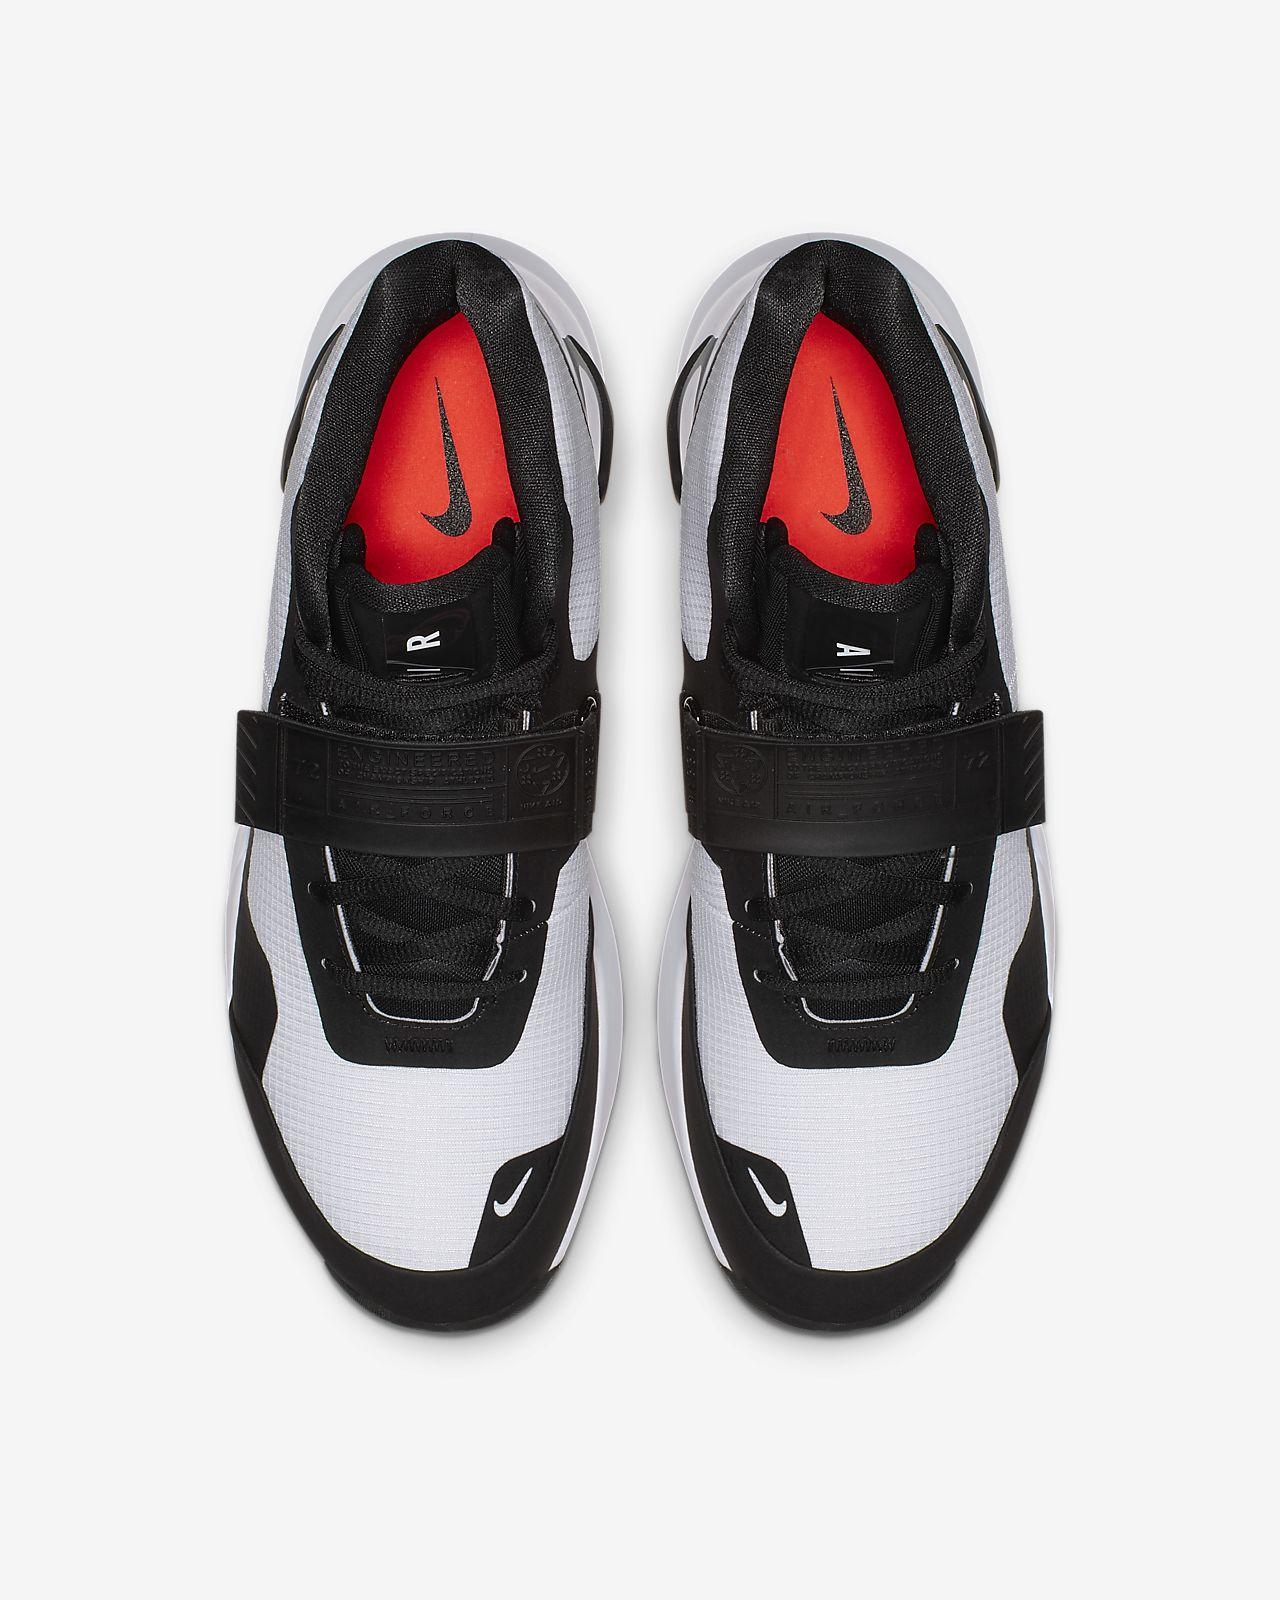 75547a1378c3 Nike Air Force Max Basketball Shoe. Nike.com